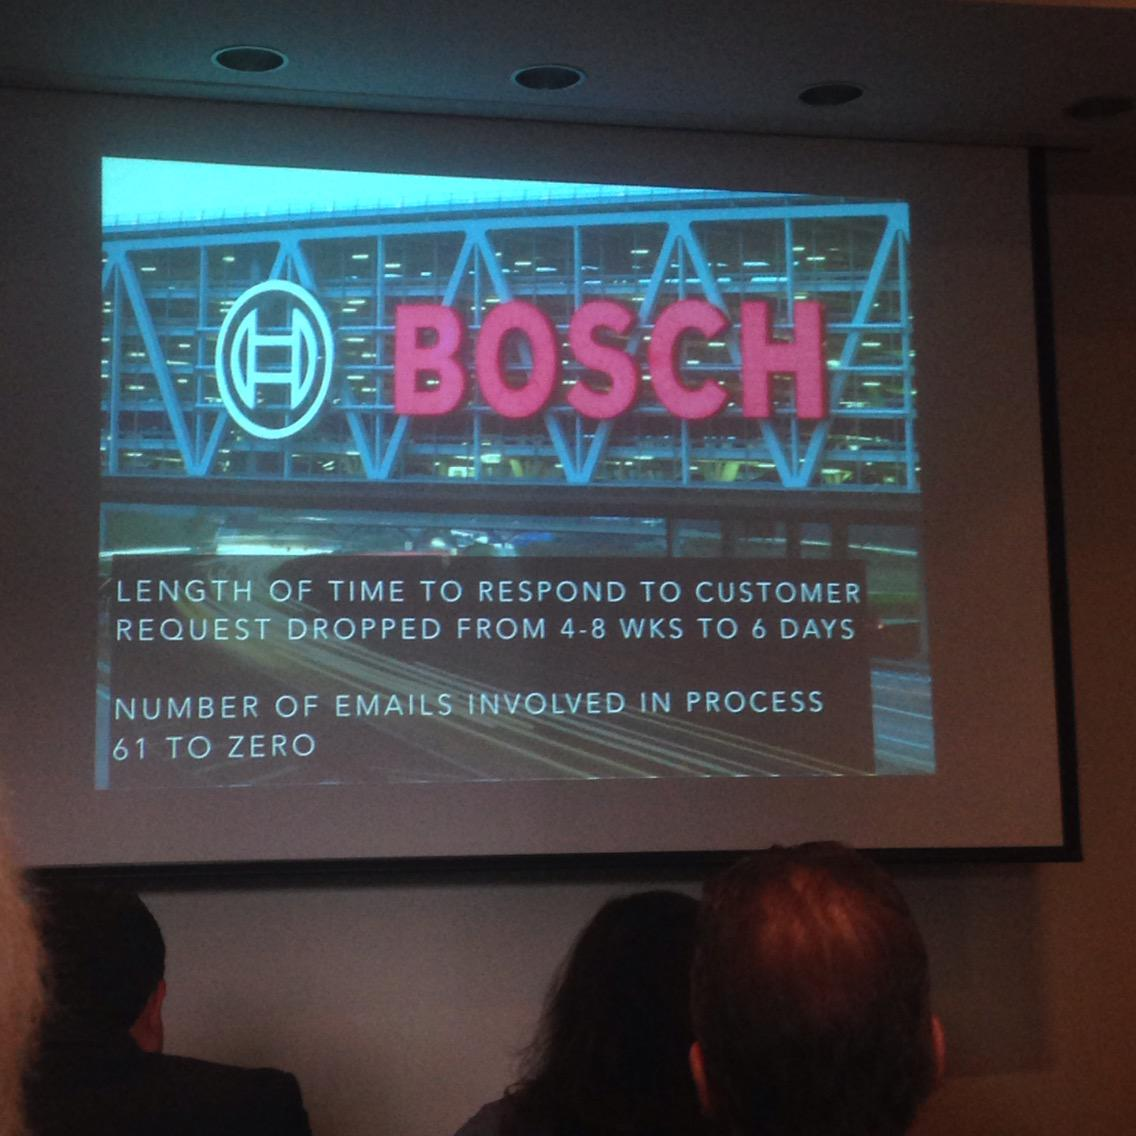 Bosch reference #soccnx http://t.co/RddOtGJ1YC